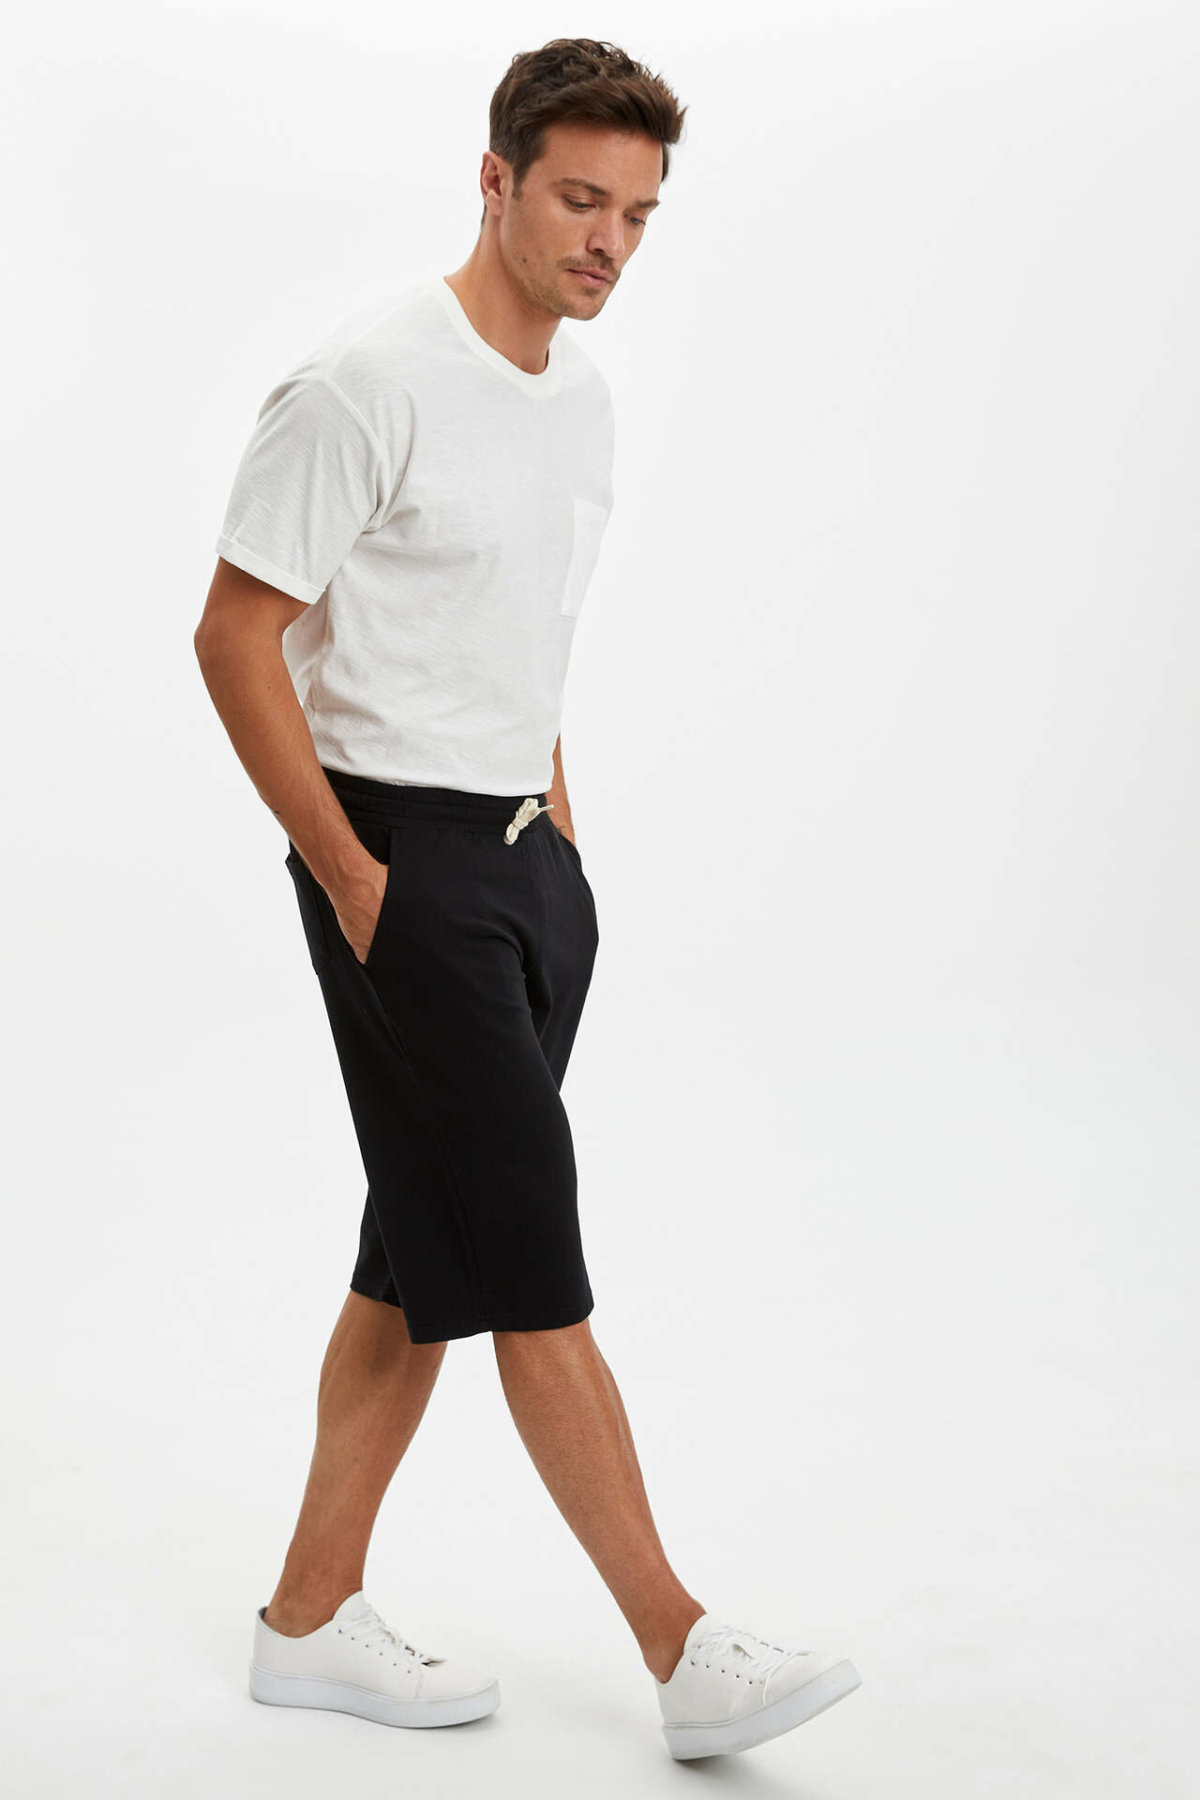 DeFacto Man's Roller Pants Men's Casual Black Bottoms Men's Summer Shorts Men's Mid-length Short Pants-N7999AZ20SM